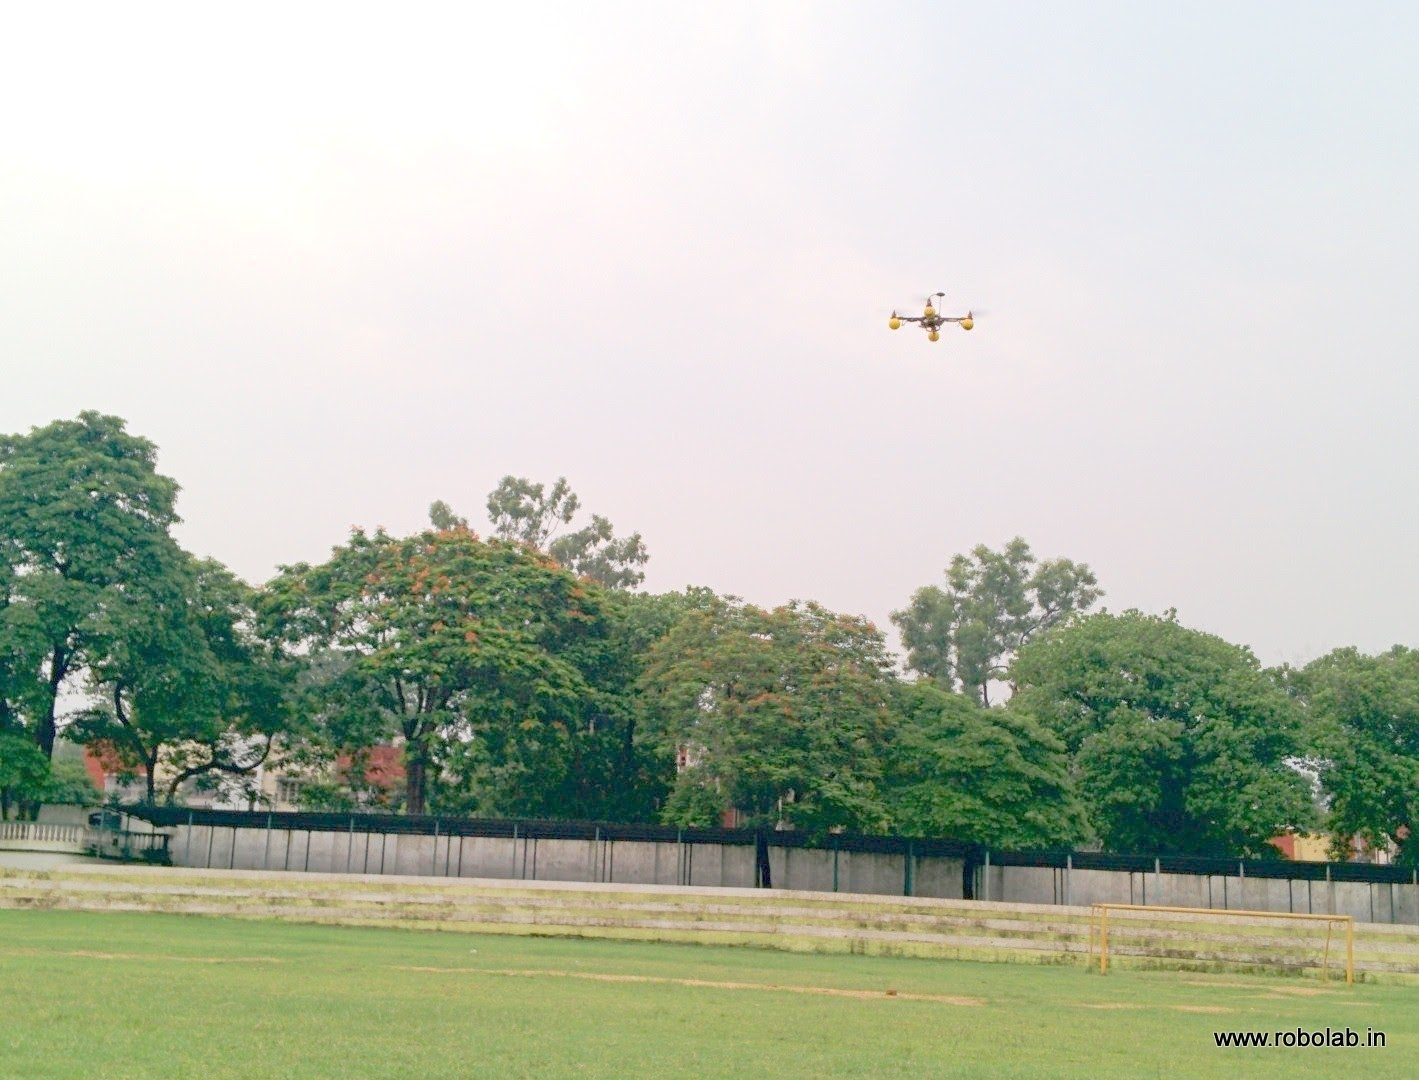 Delhi Public School, Bokaro, Robolab (27).jpg